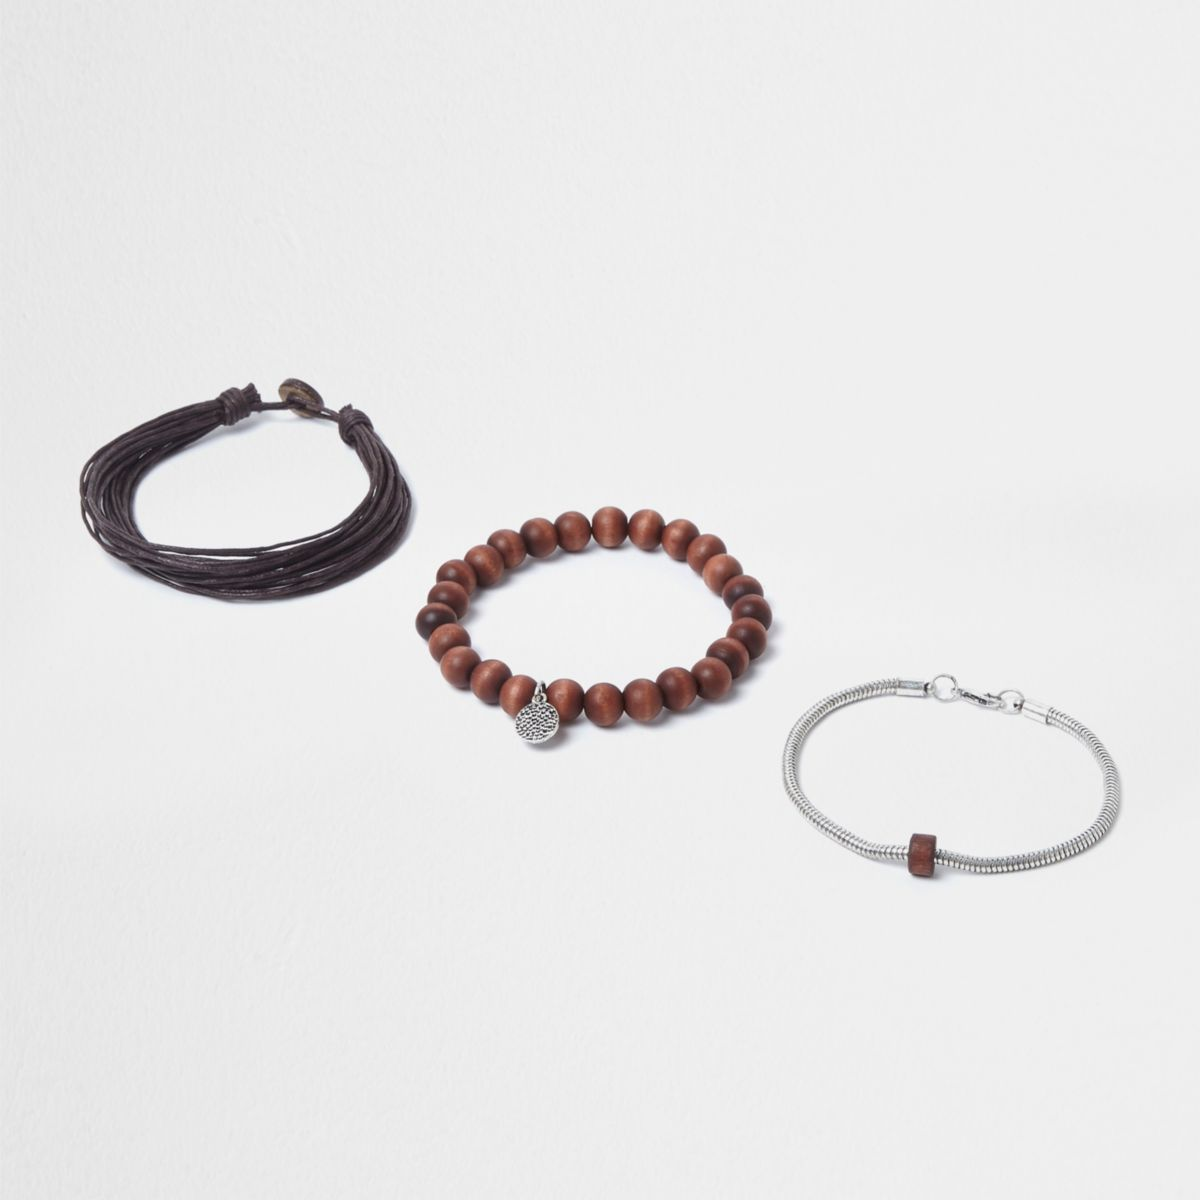 Brown wooden beaded bracelet set